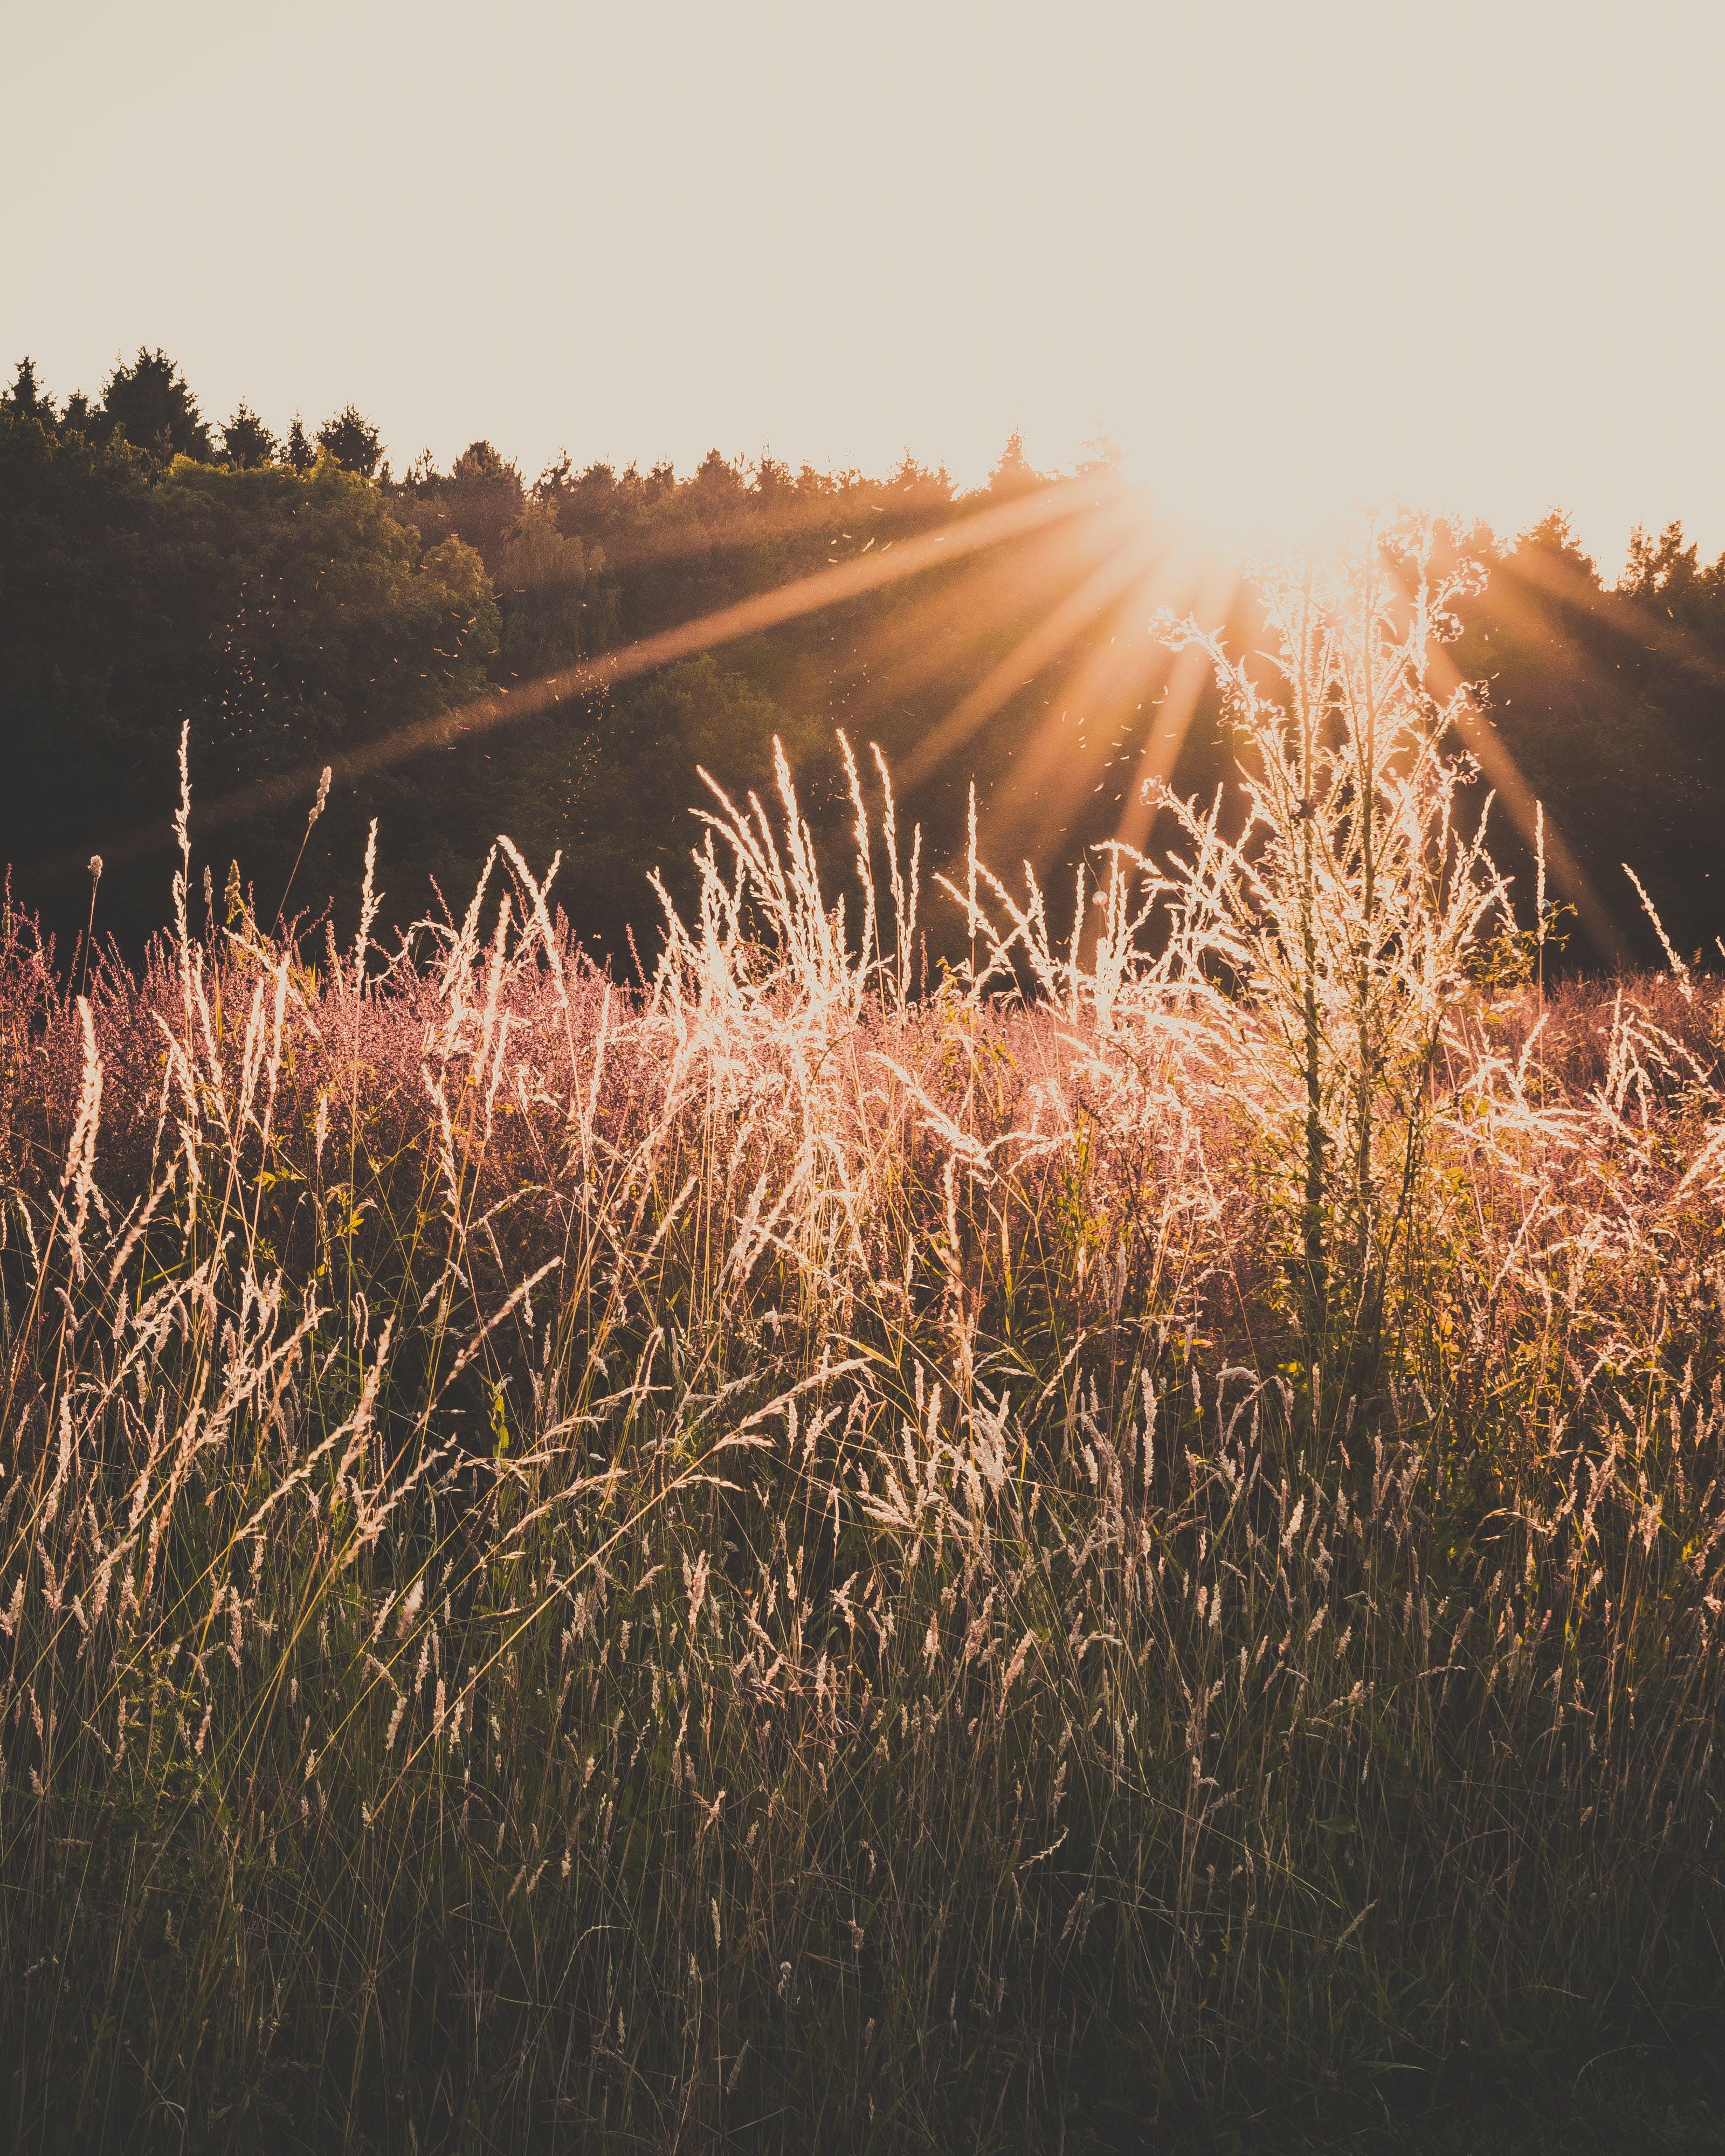 Green Grass Field during Orange Sunset